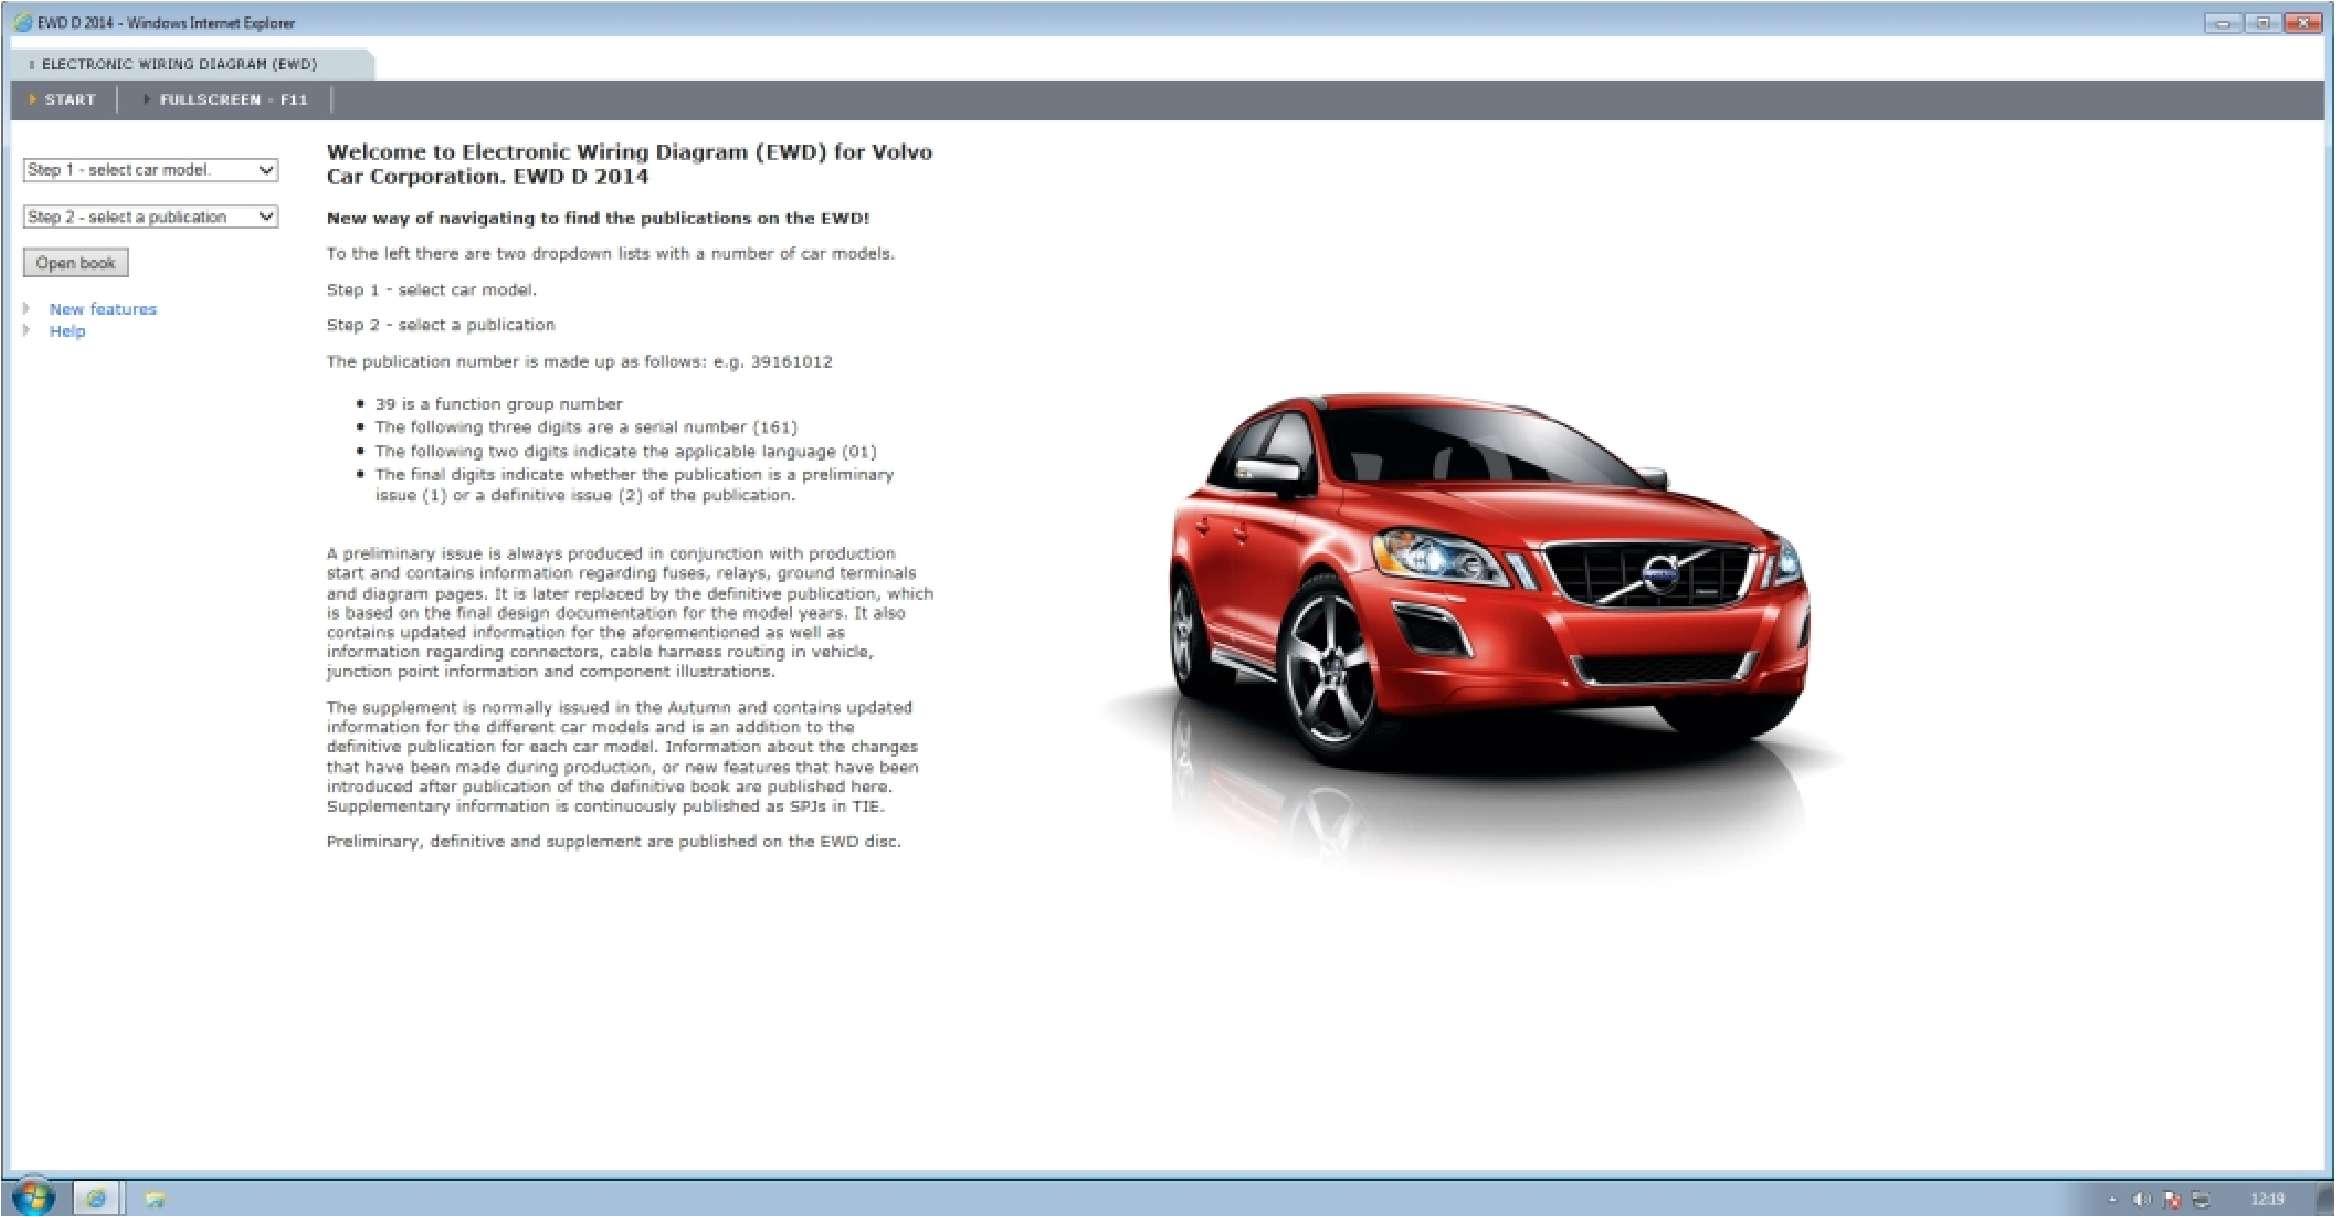 Volvo EWD ss-01